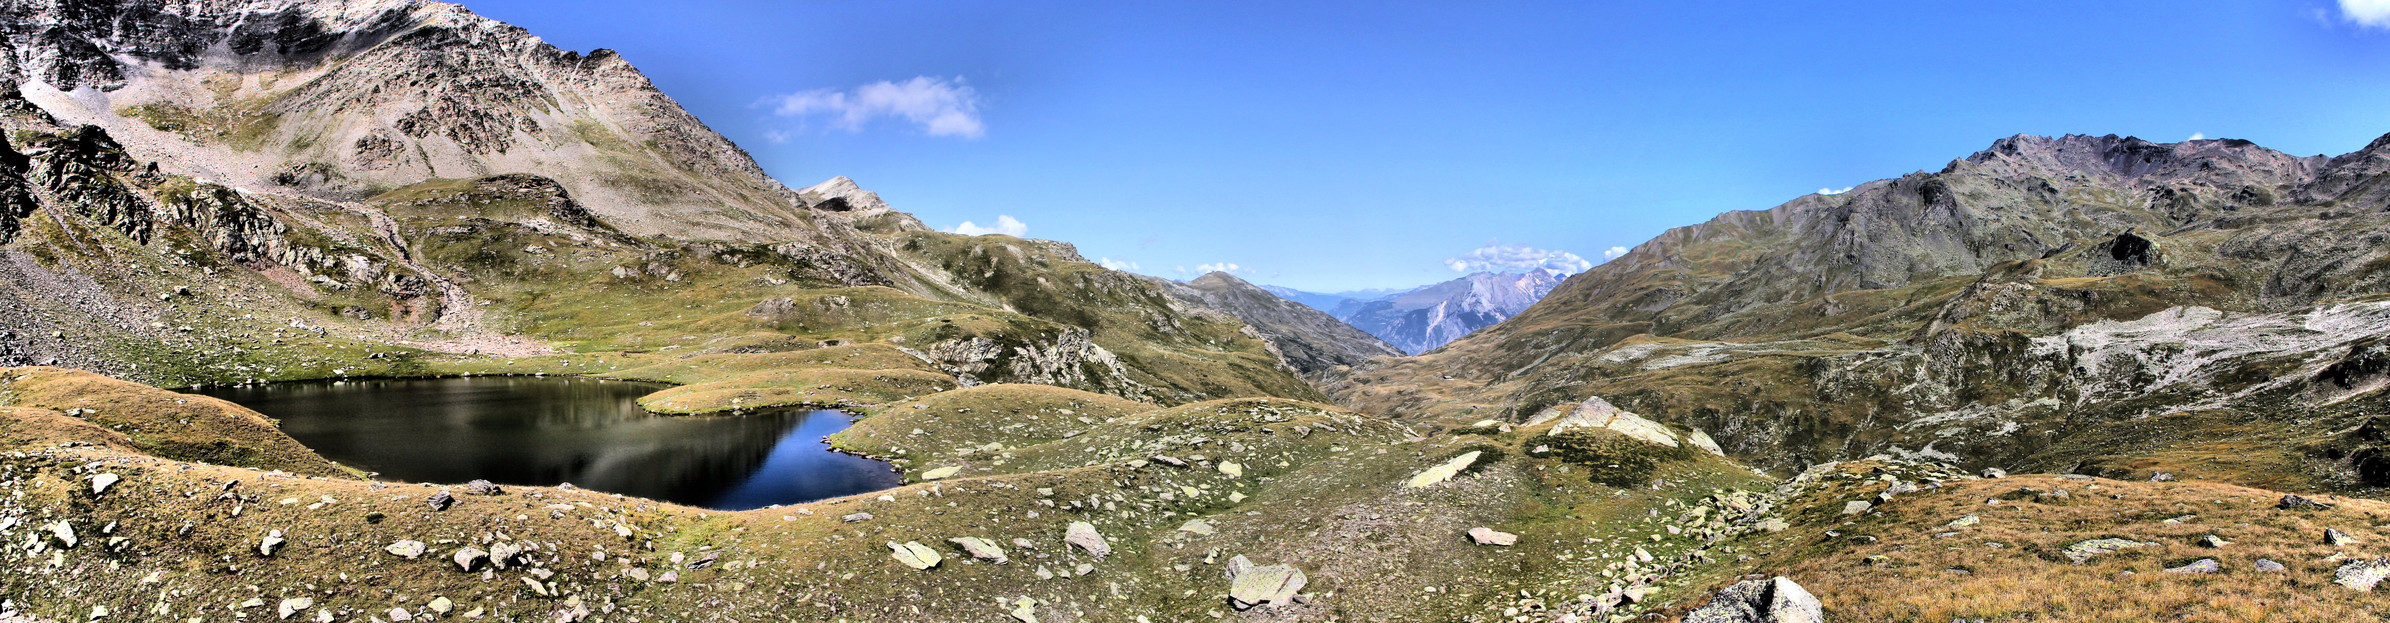 Panorama15.jpg